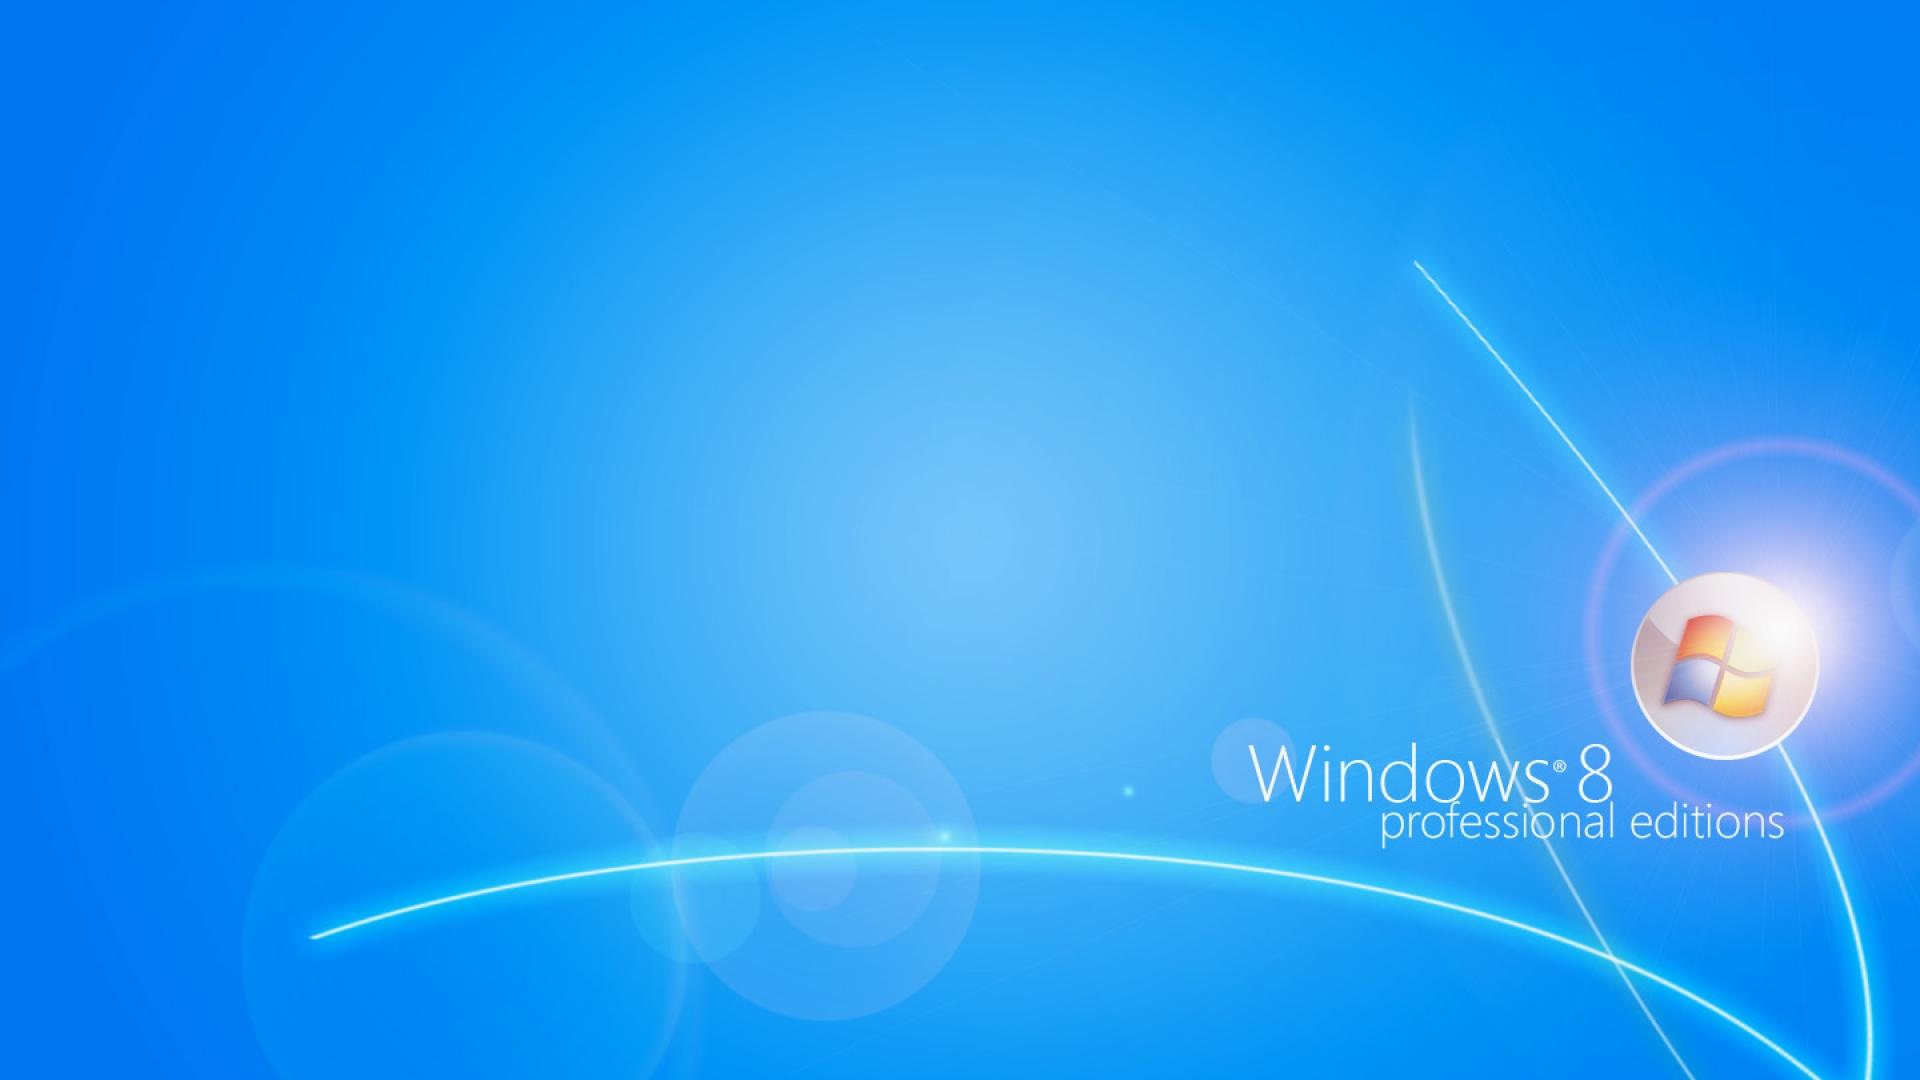 Best Windows Hd Wallpaper Mytechshout Windows Professional Hd